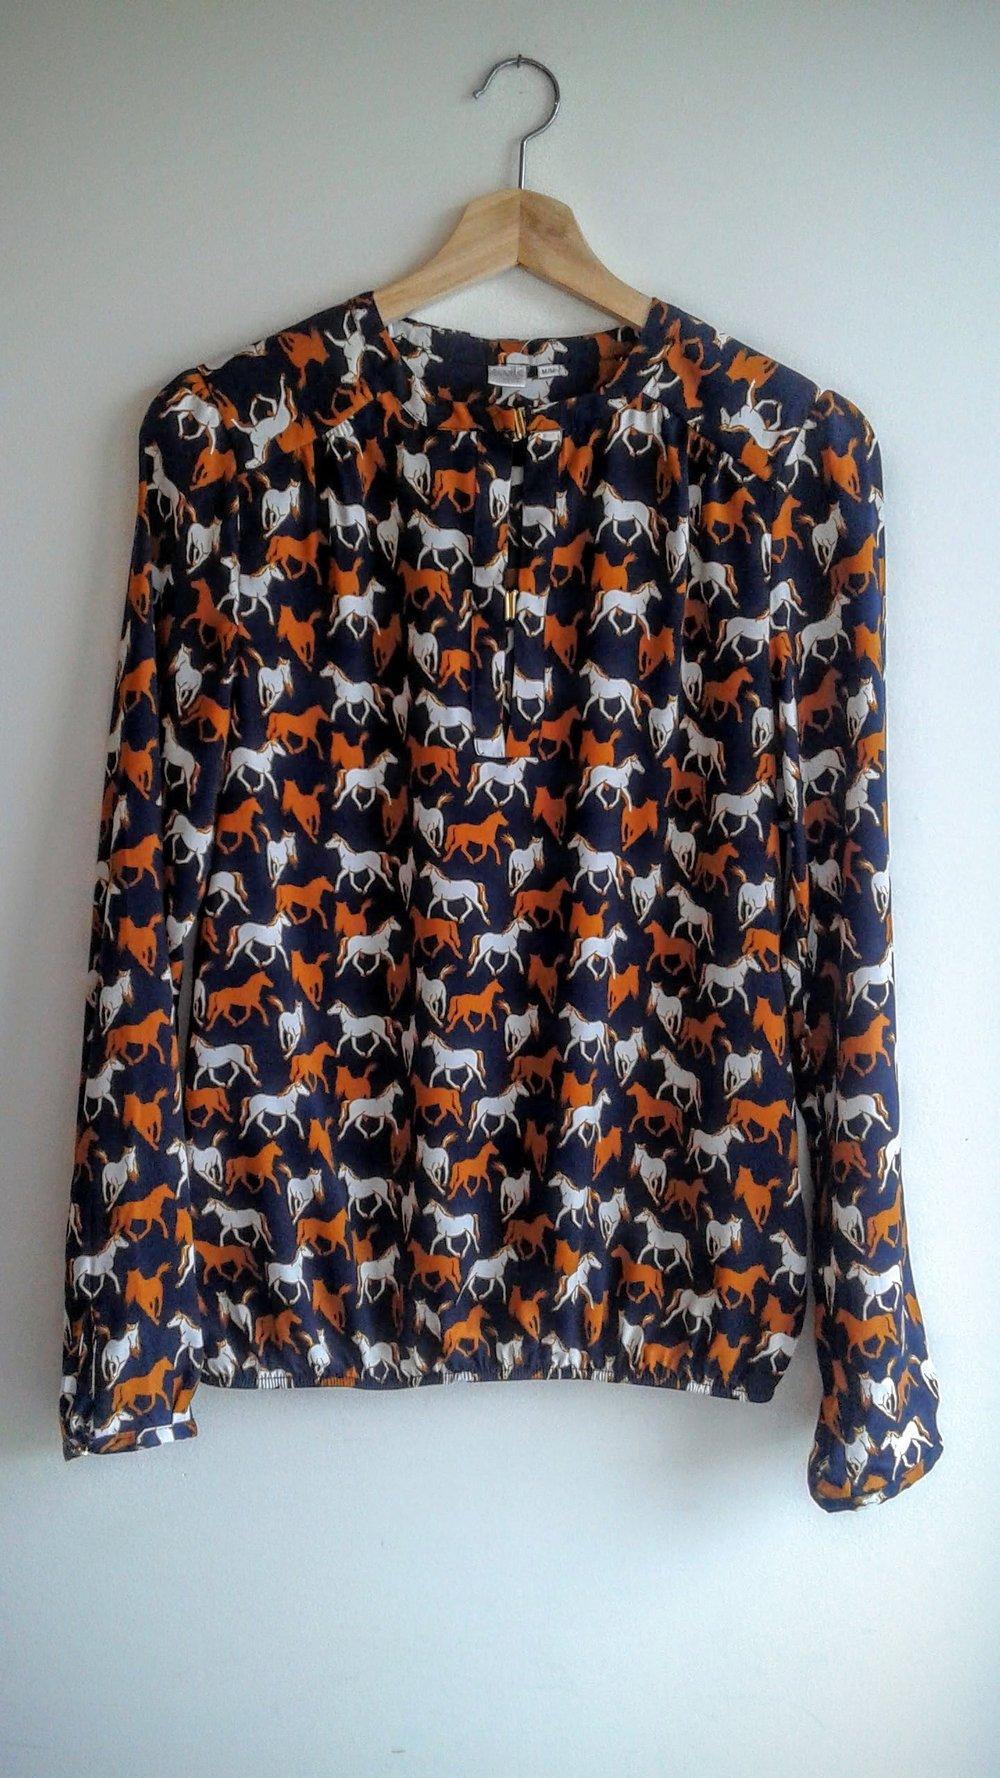 Twik shirt; Size M, $26